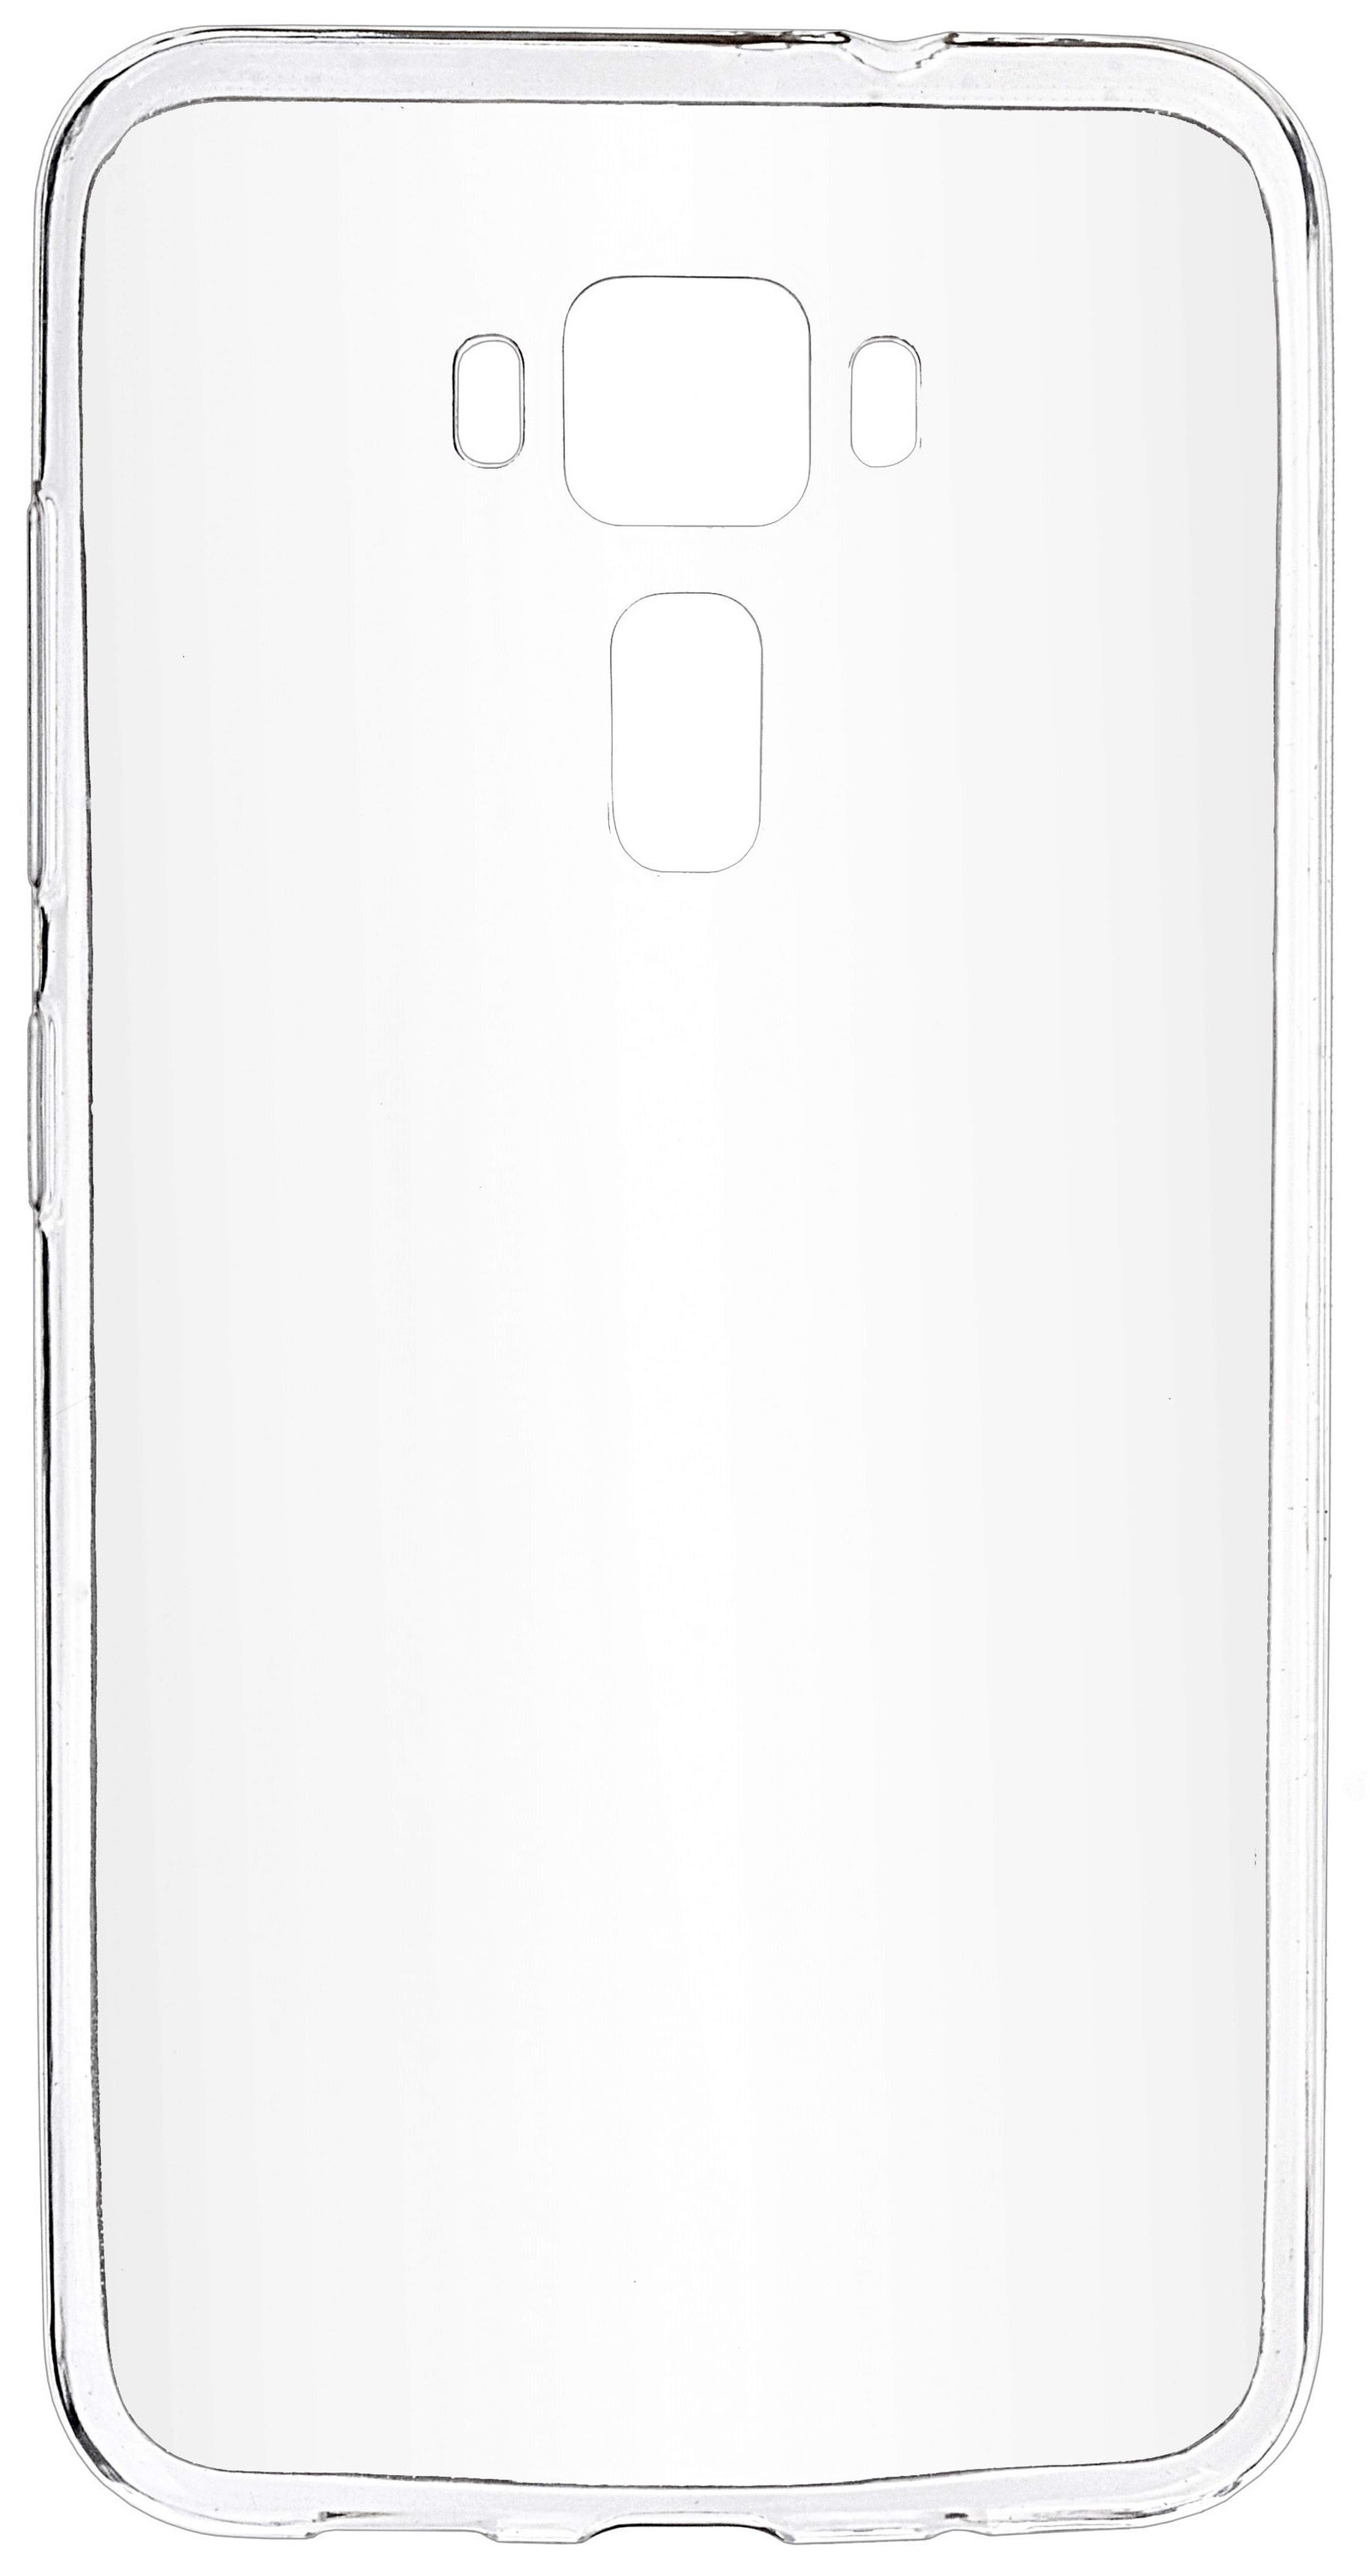 Чехол для сотового телефона skinBOX Slim Silicone, 4630042528475, прозрачный чехол для сотового телефона skinbox slim silicone 4660041408157 прозрачный